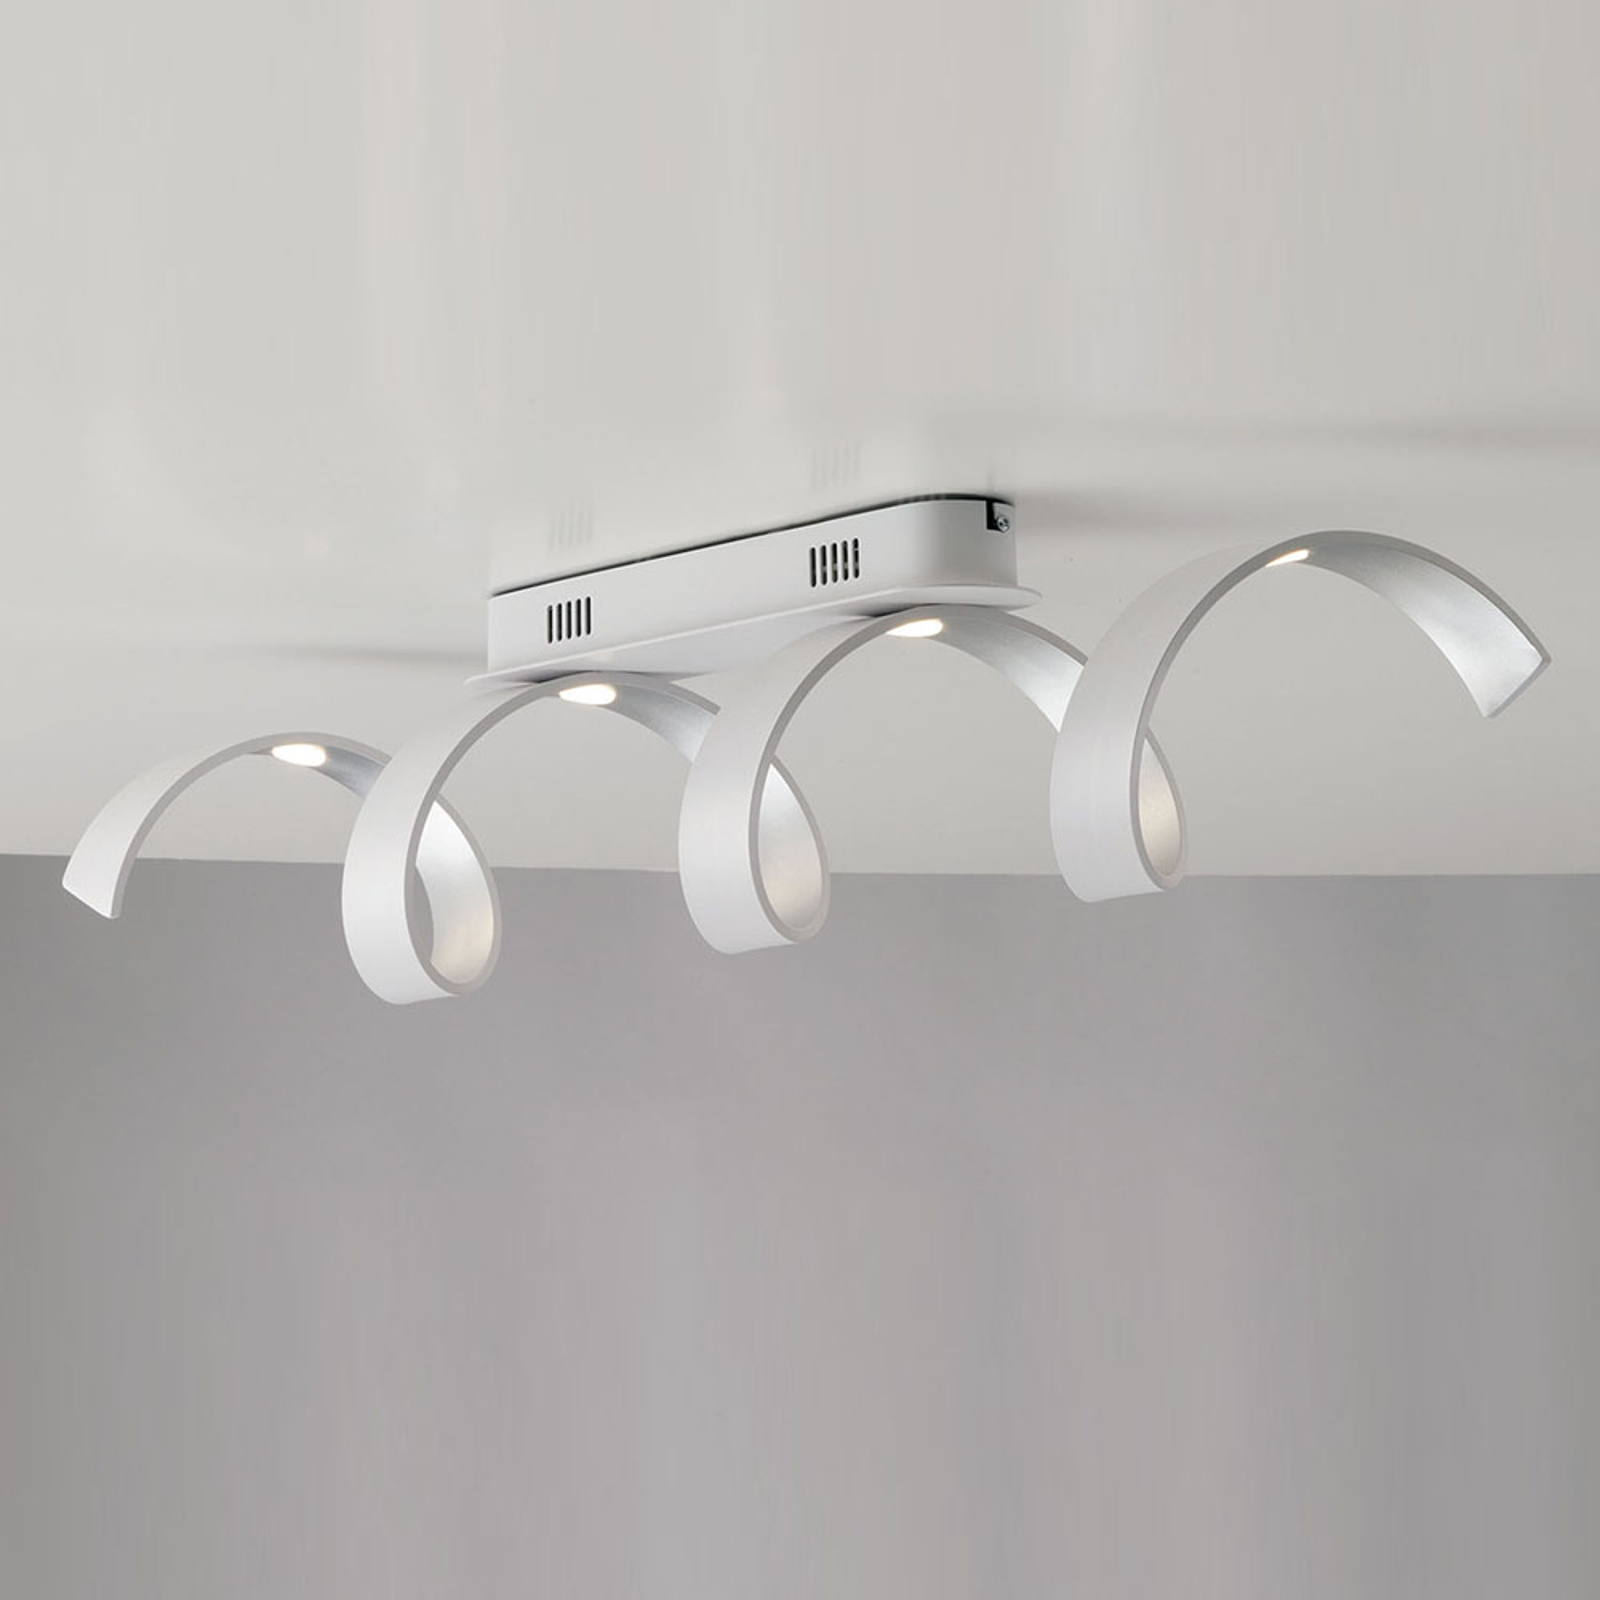 Lampa sufitowa LED Helix biało-srebrna